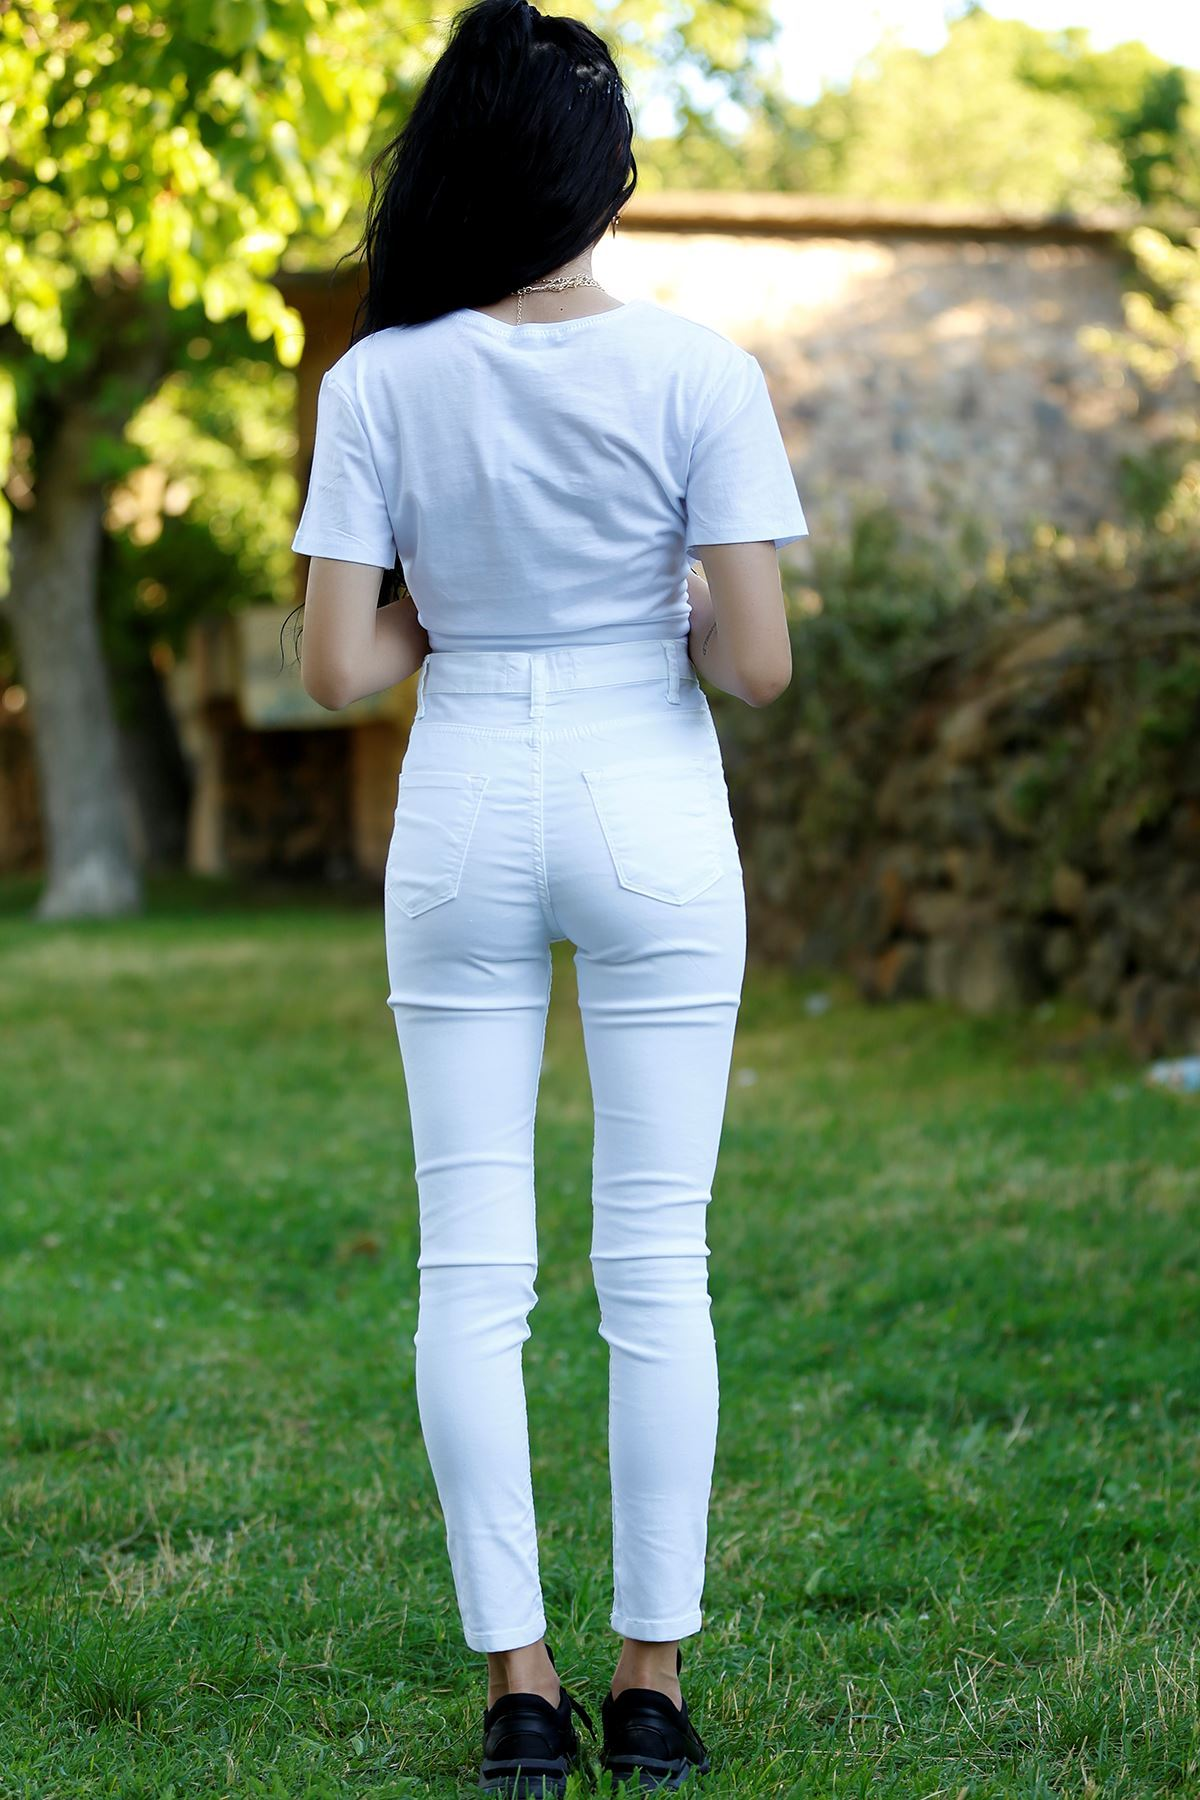 Dar Pantolon Beyaz - 2347.925. - k.p